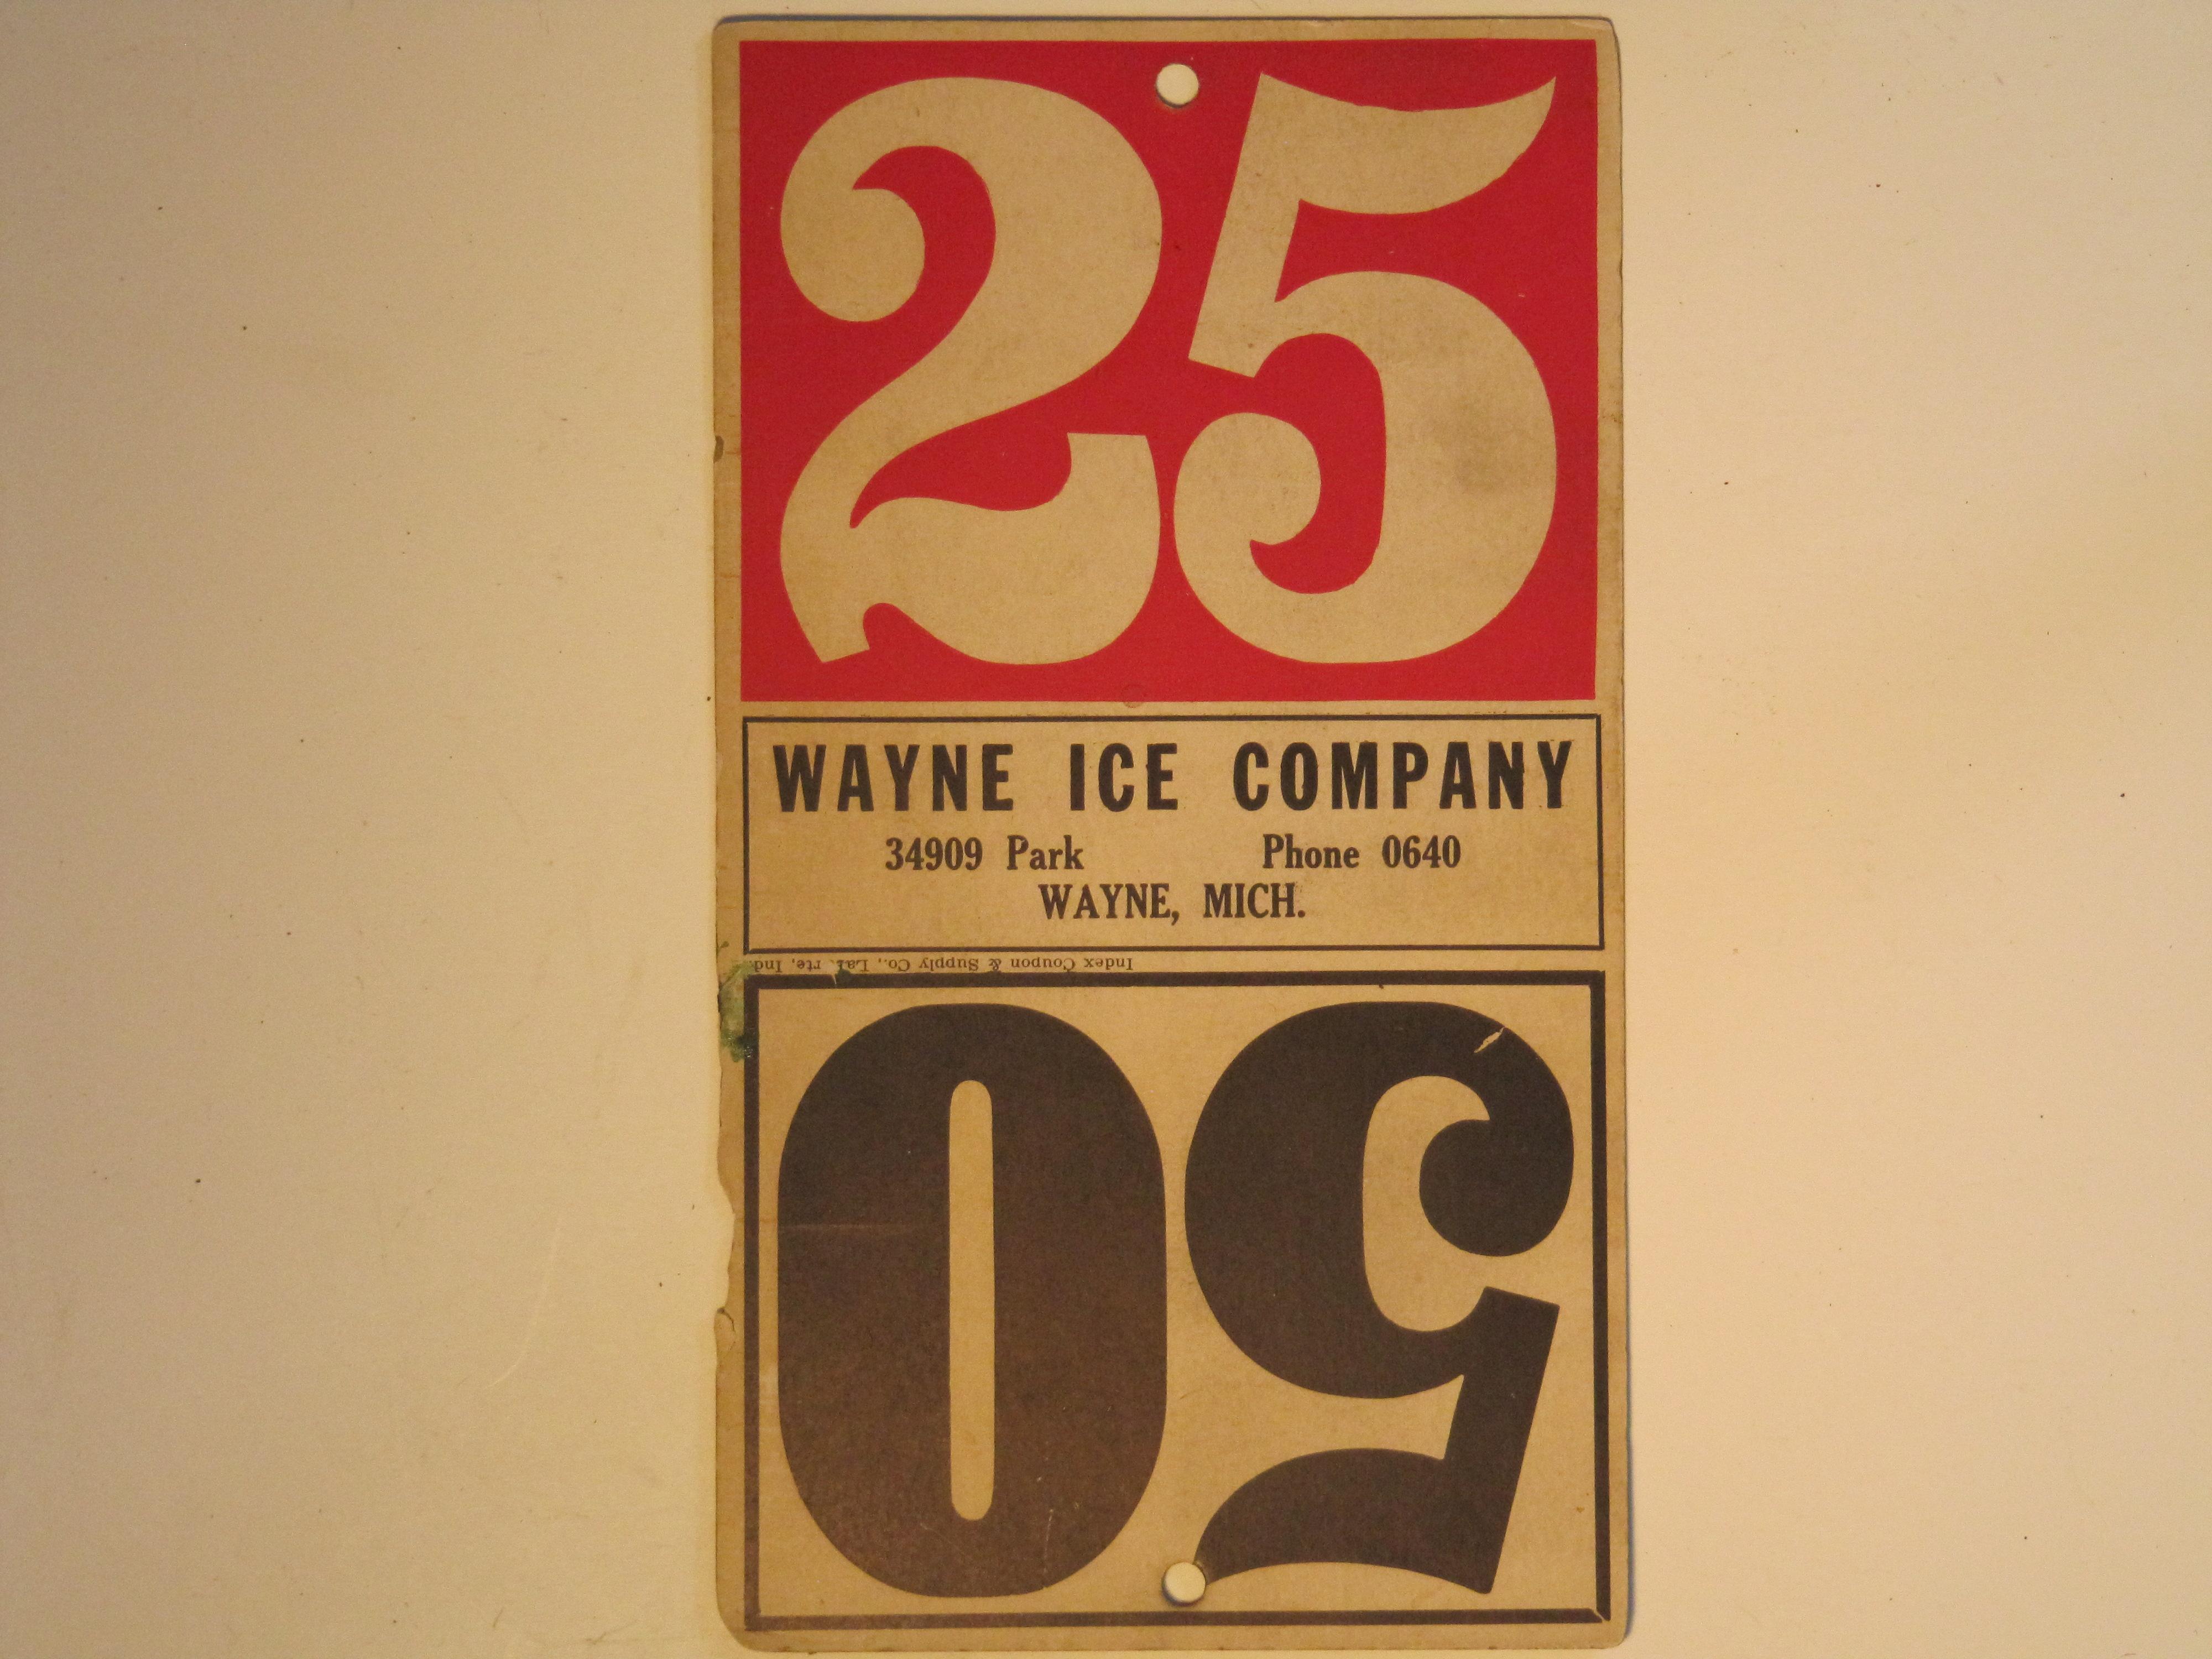 Wayne Ice Co.